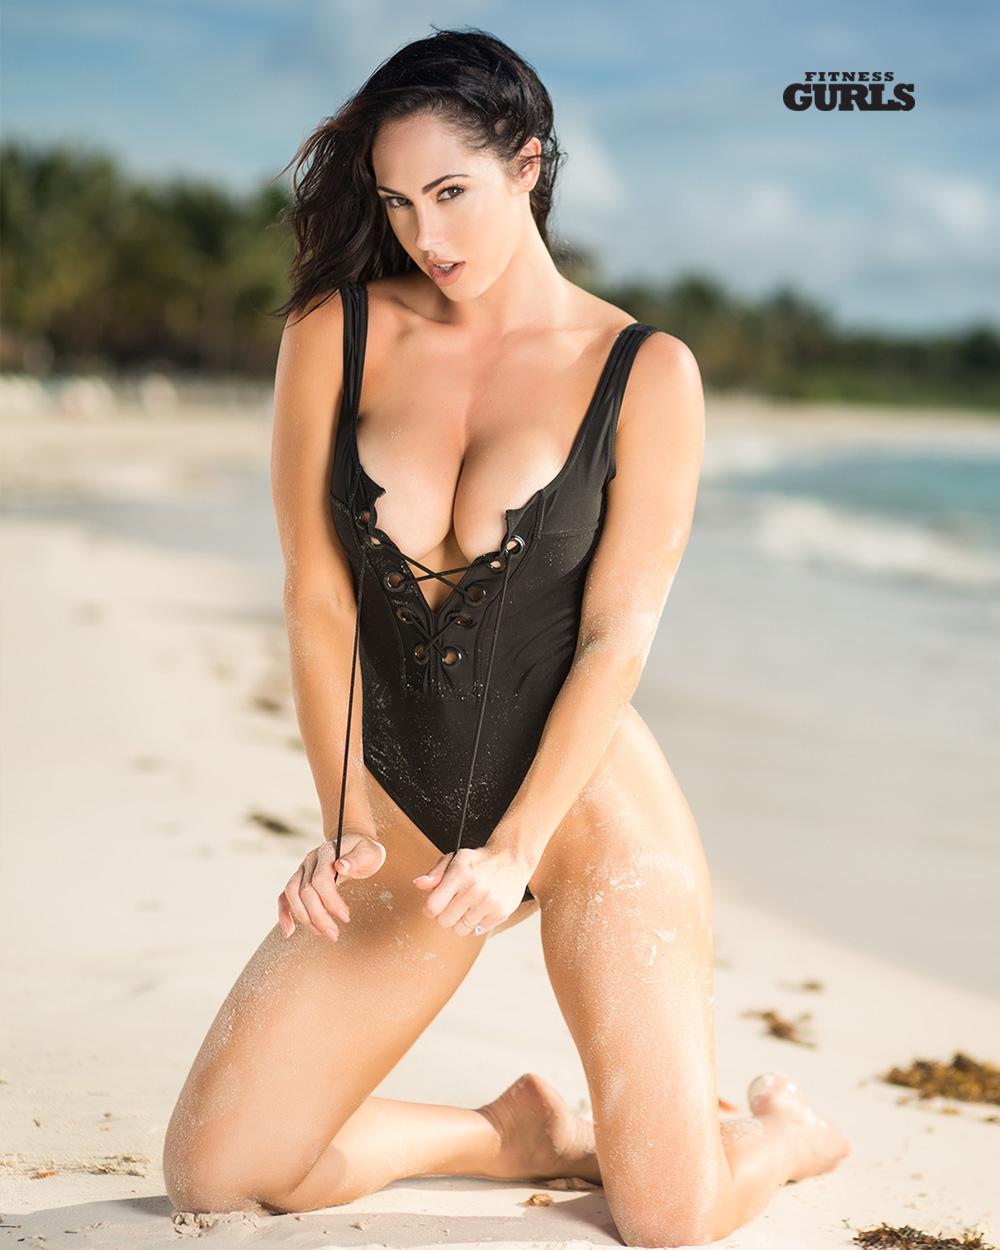 Hope Beel nudes (68 foto and video), Pussy, Bikini, Boobs, swimsuit 2017